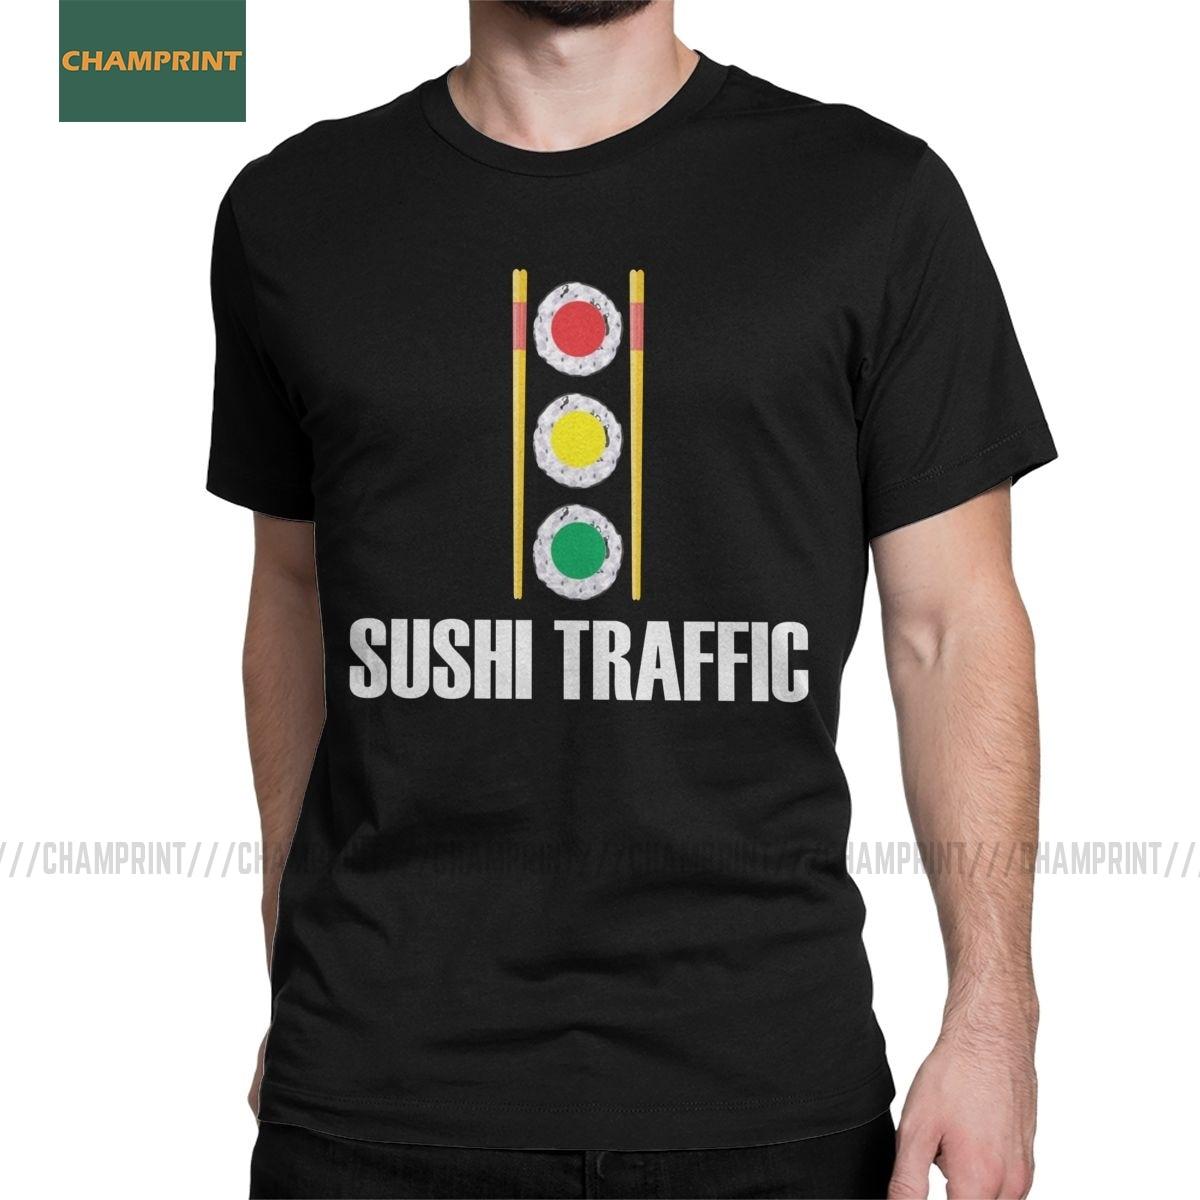 Divertido Sushi Pun Asian Food Traffic Light camisetas para hombres Camiseta de algodón Wasabi Rice Cartoon Nigiri Salmon camiseta de pez de manga corta